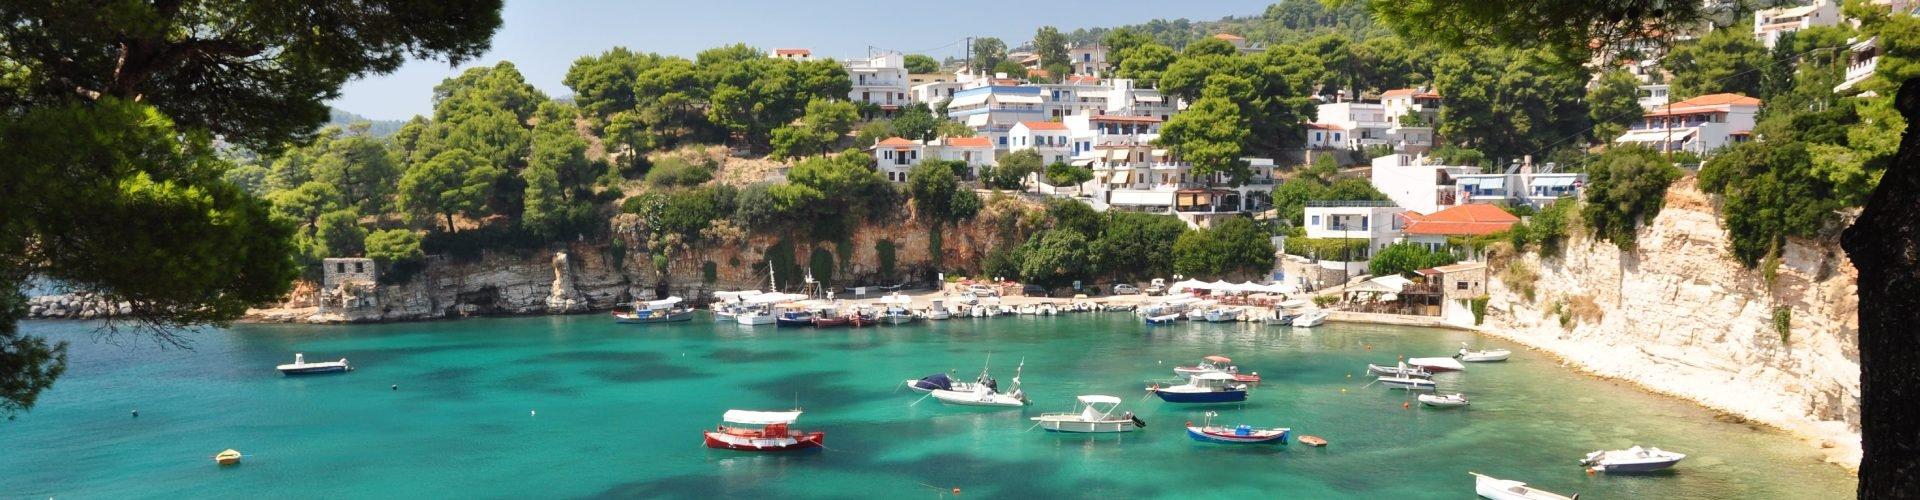 Letovanje na ostrvu Alonissos